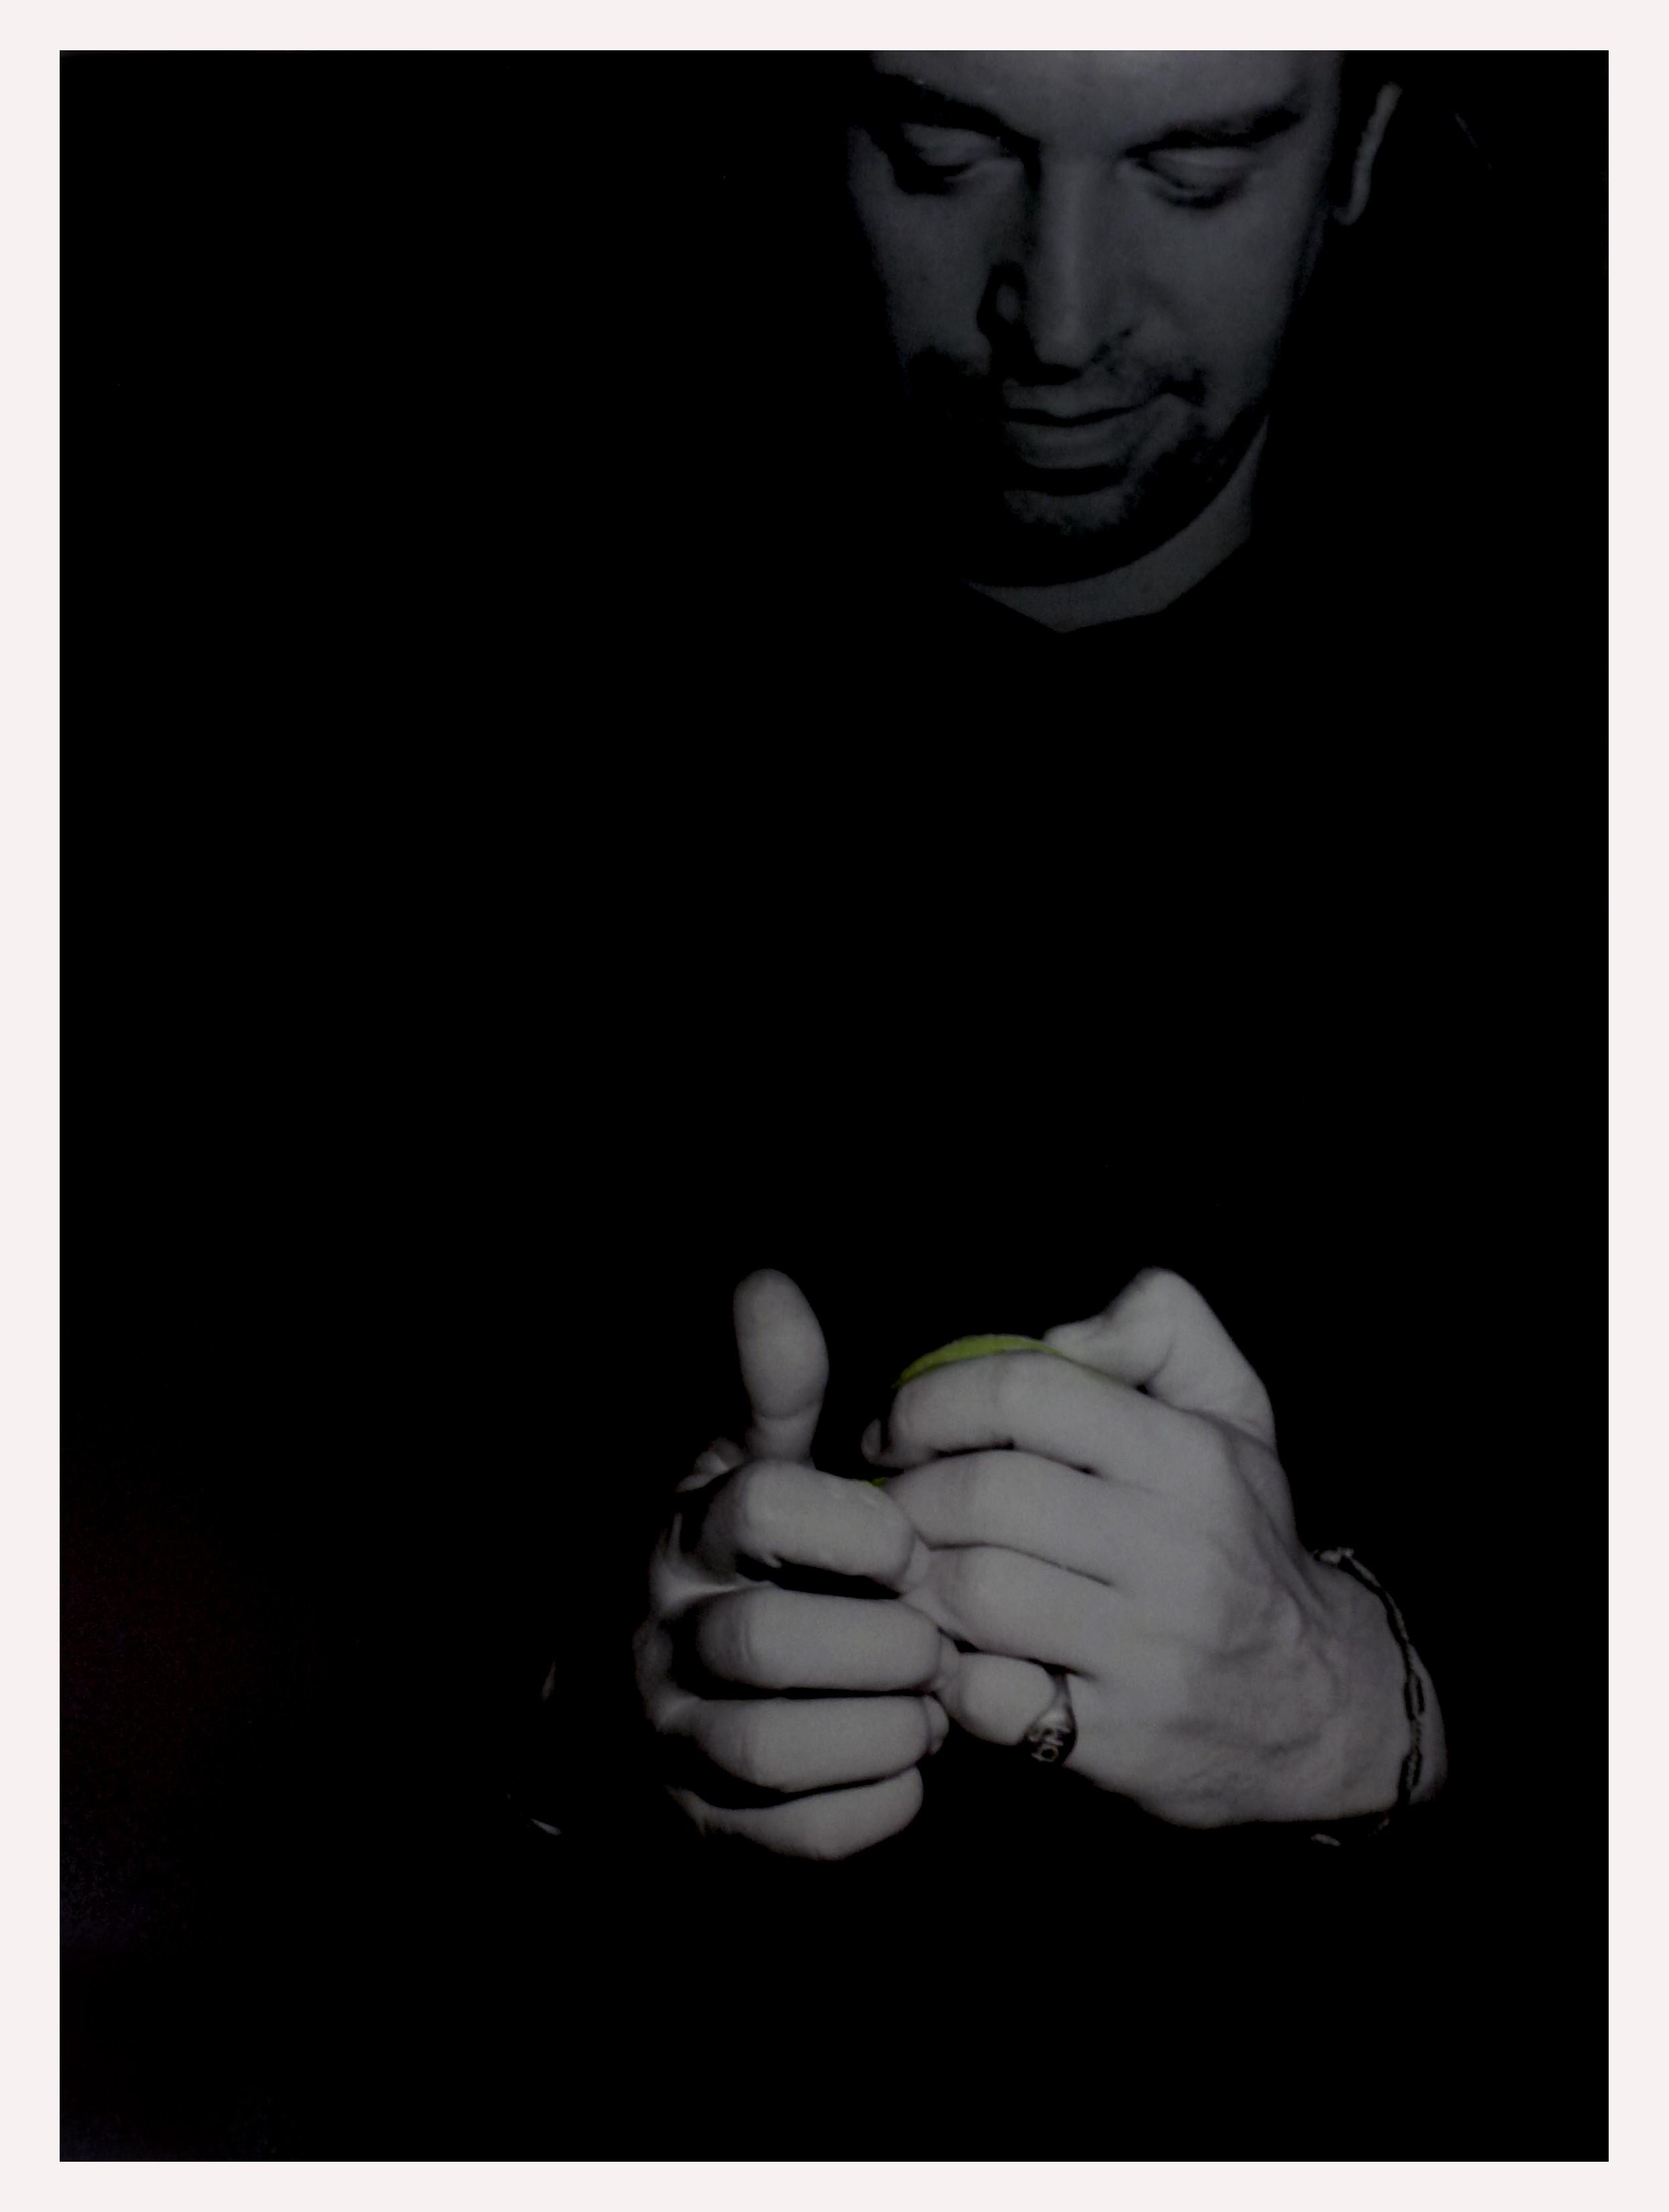 Richard Kunath | Glendale, California | November 2013